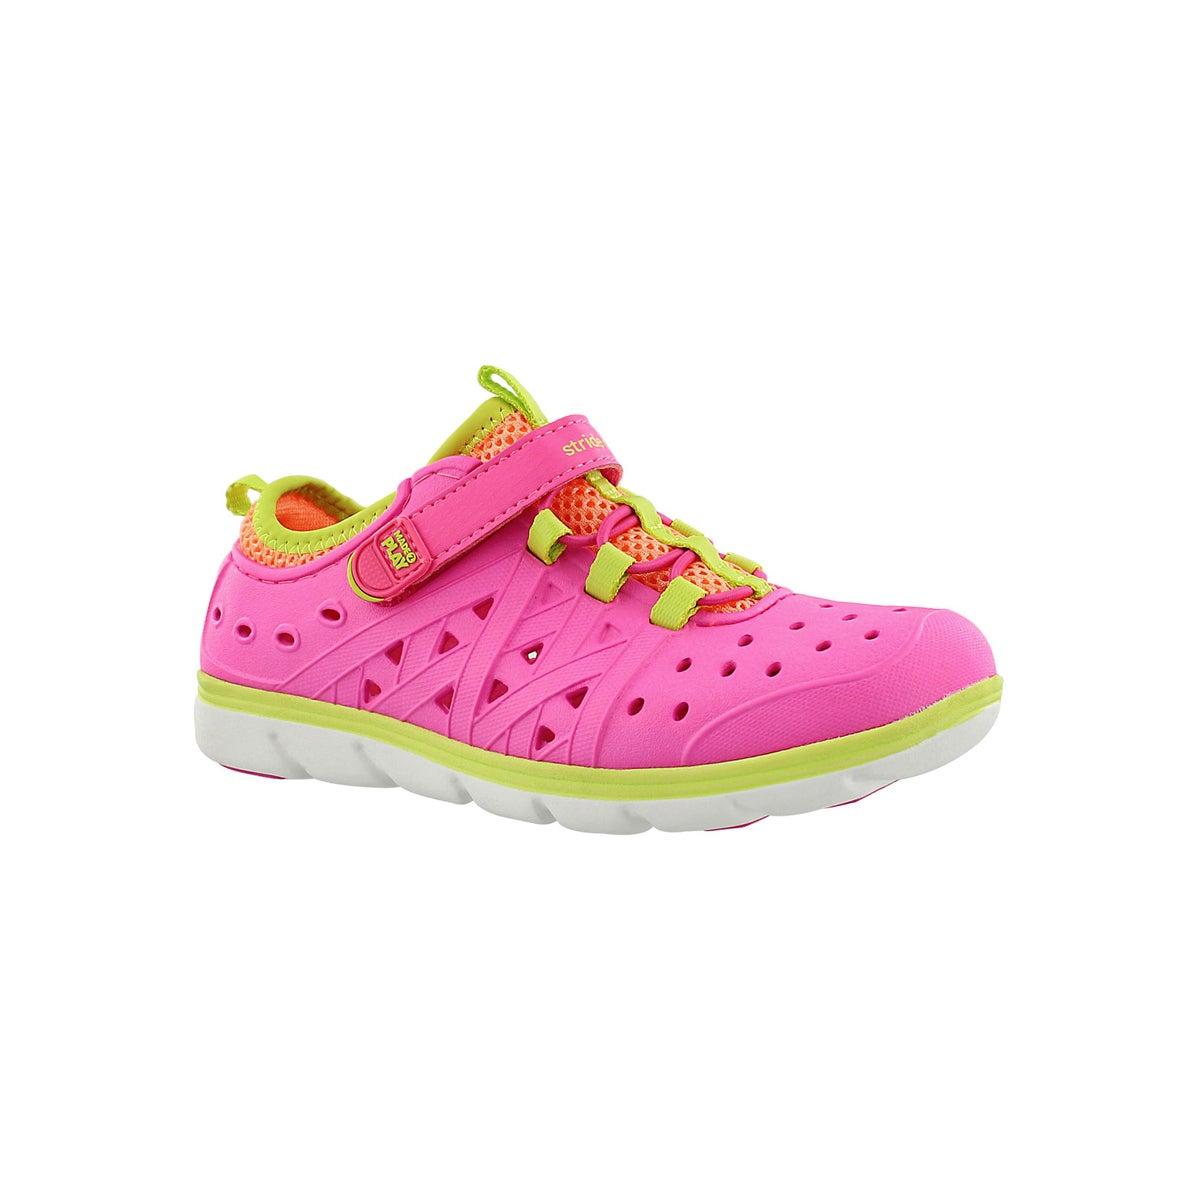 Infants' M2P PHIBIAN pink sneakers